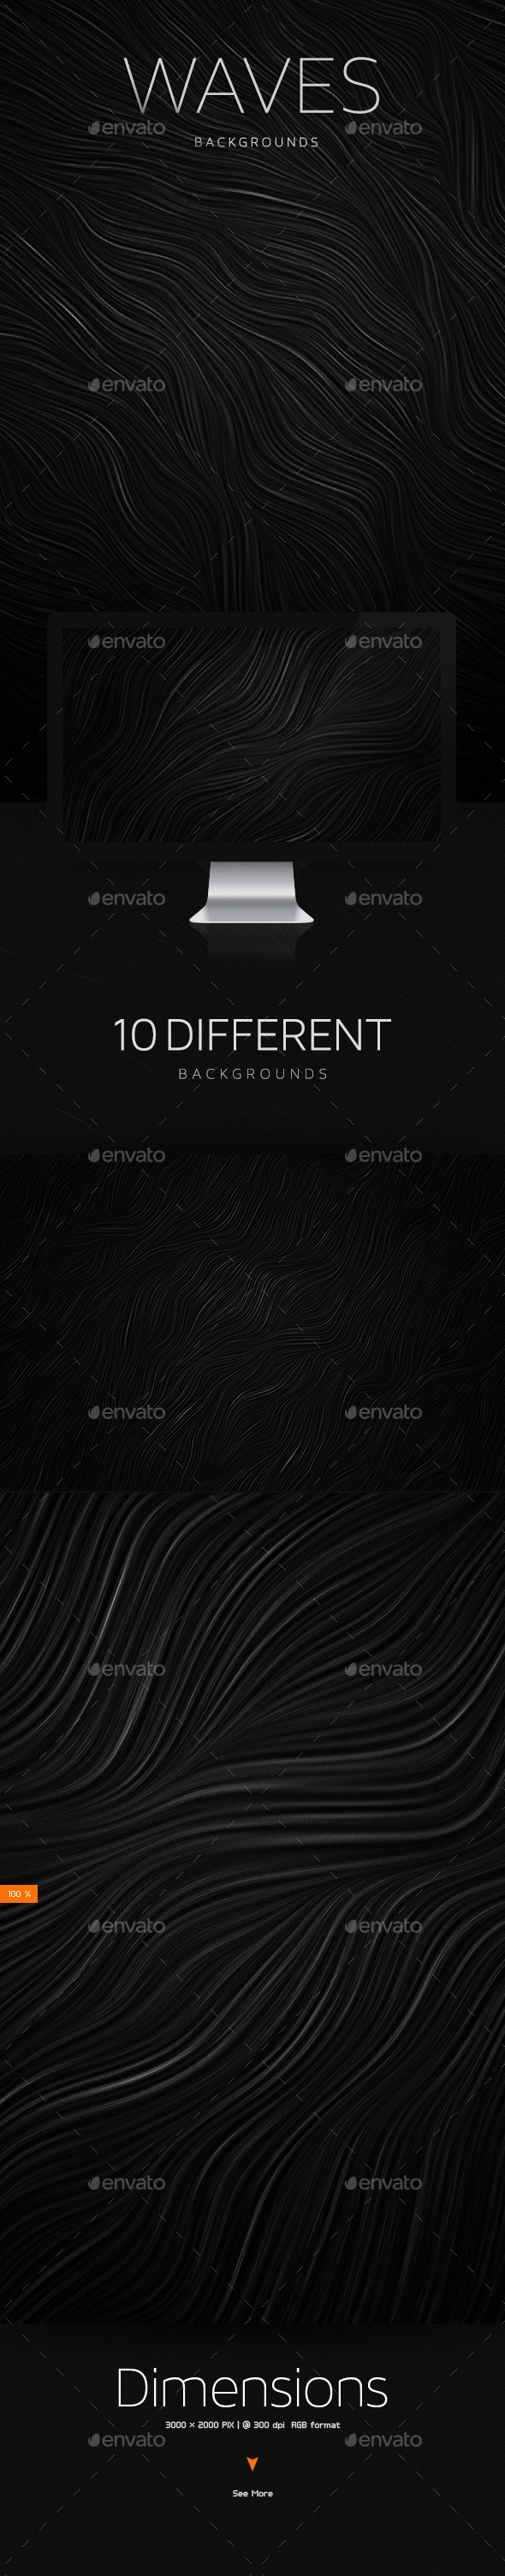 GraphicRiver Waves Subtle Textures Backgrounds 10609497